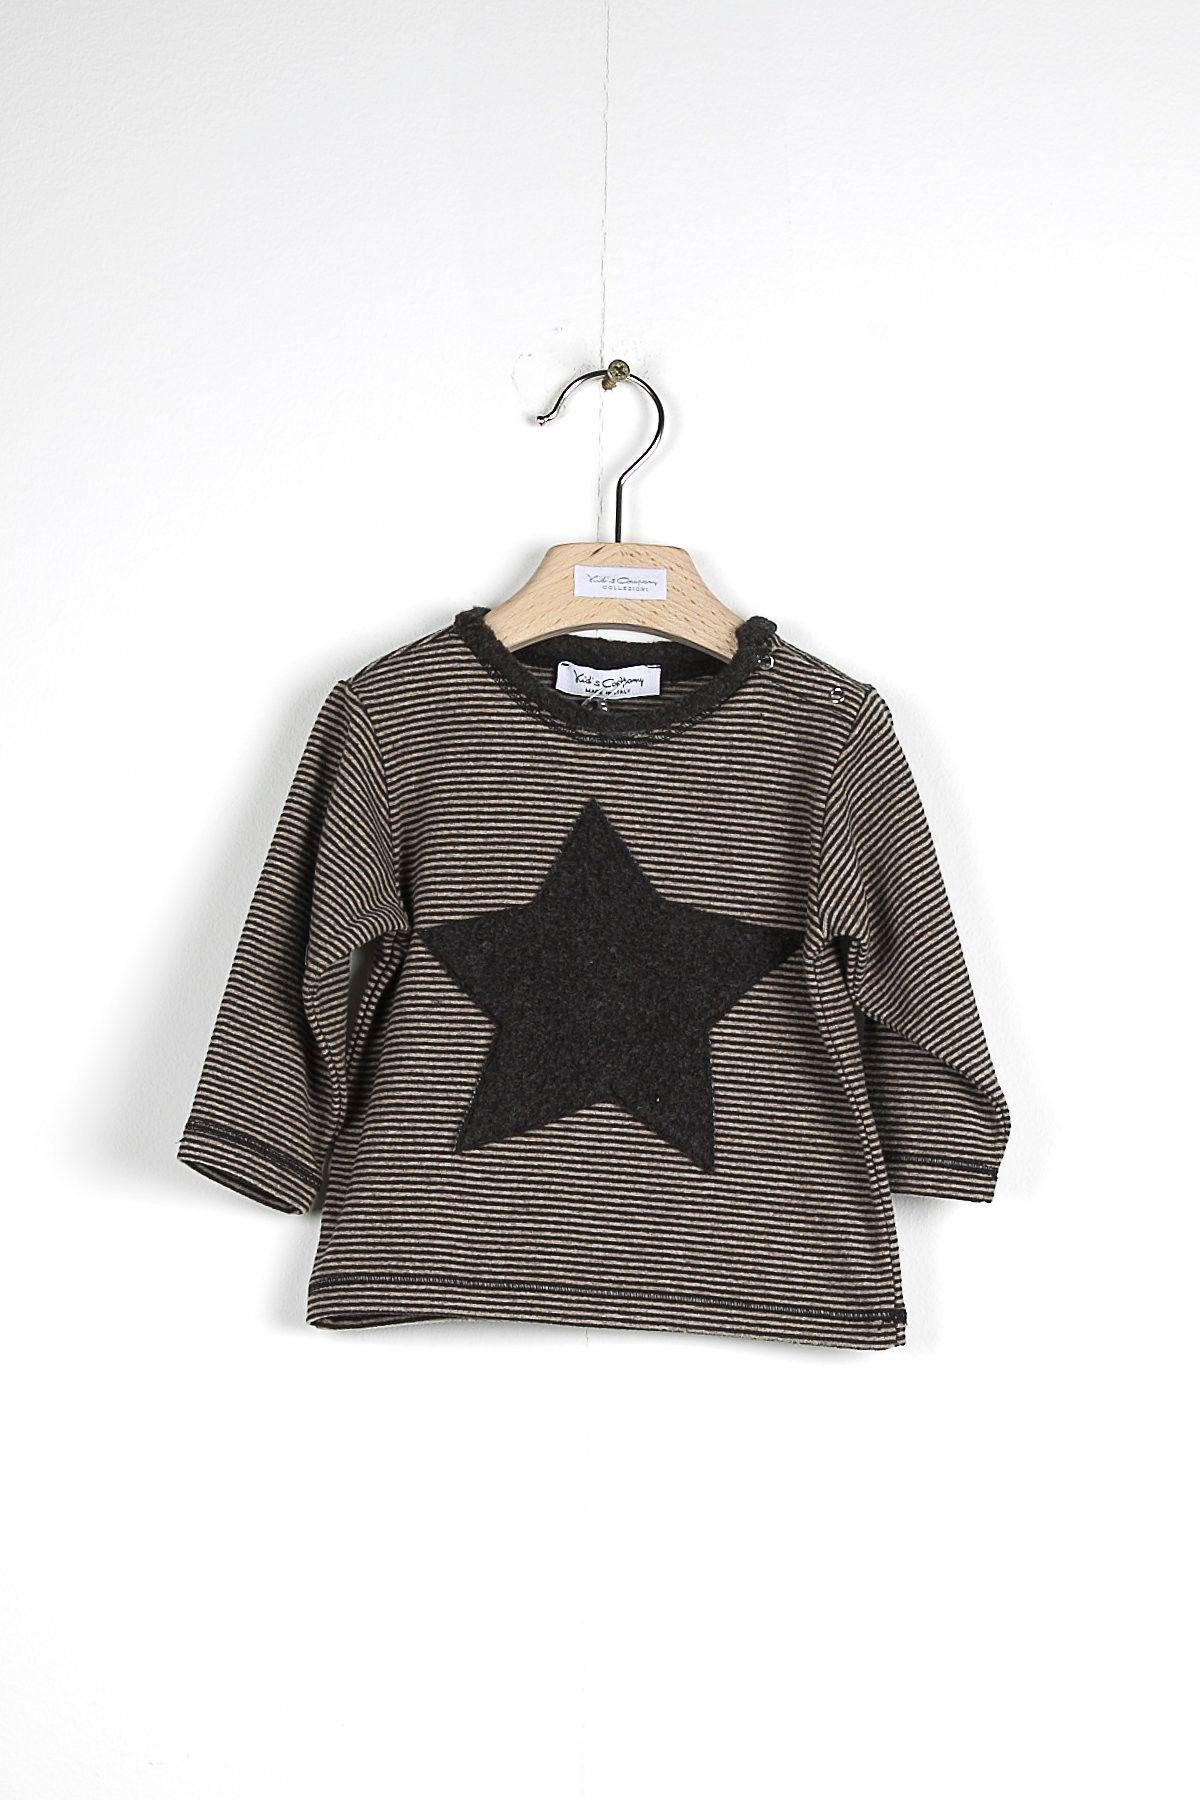 Tuta maglia stella + panta fumo KID'S COMPANY 72K1064